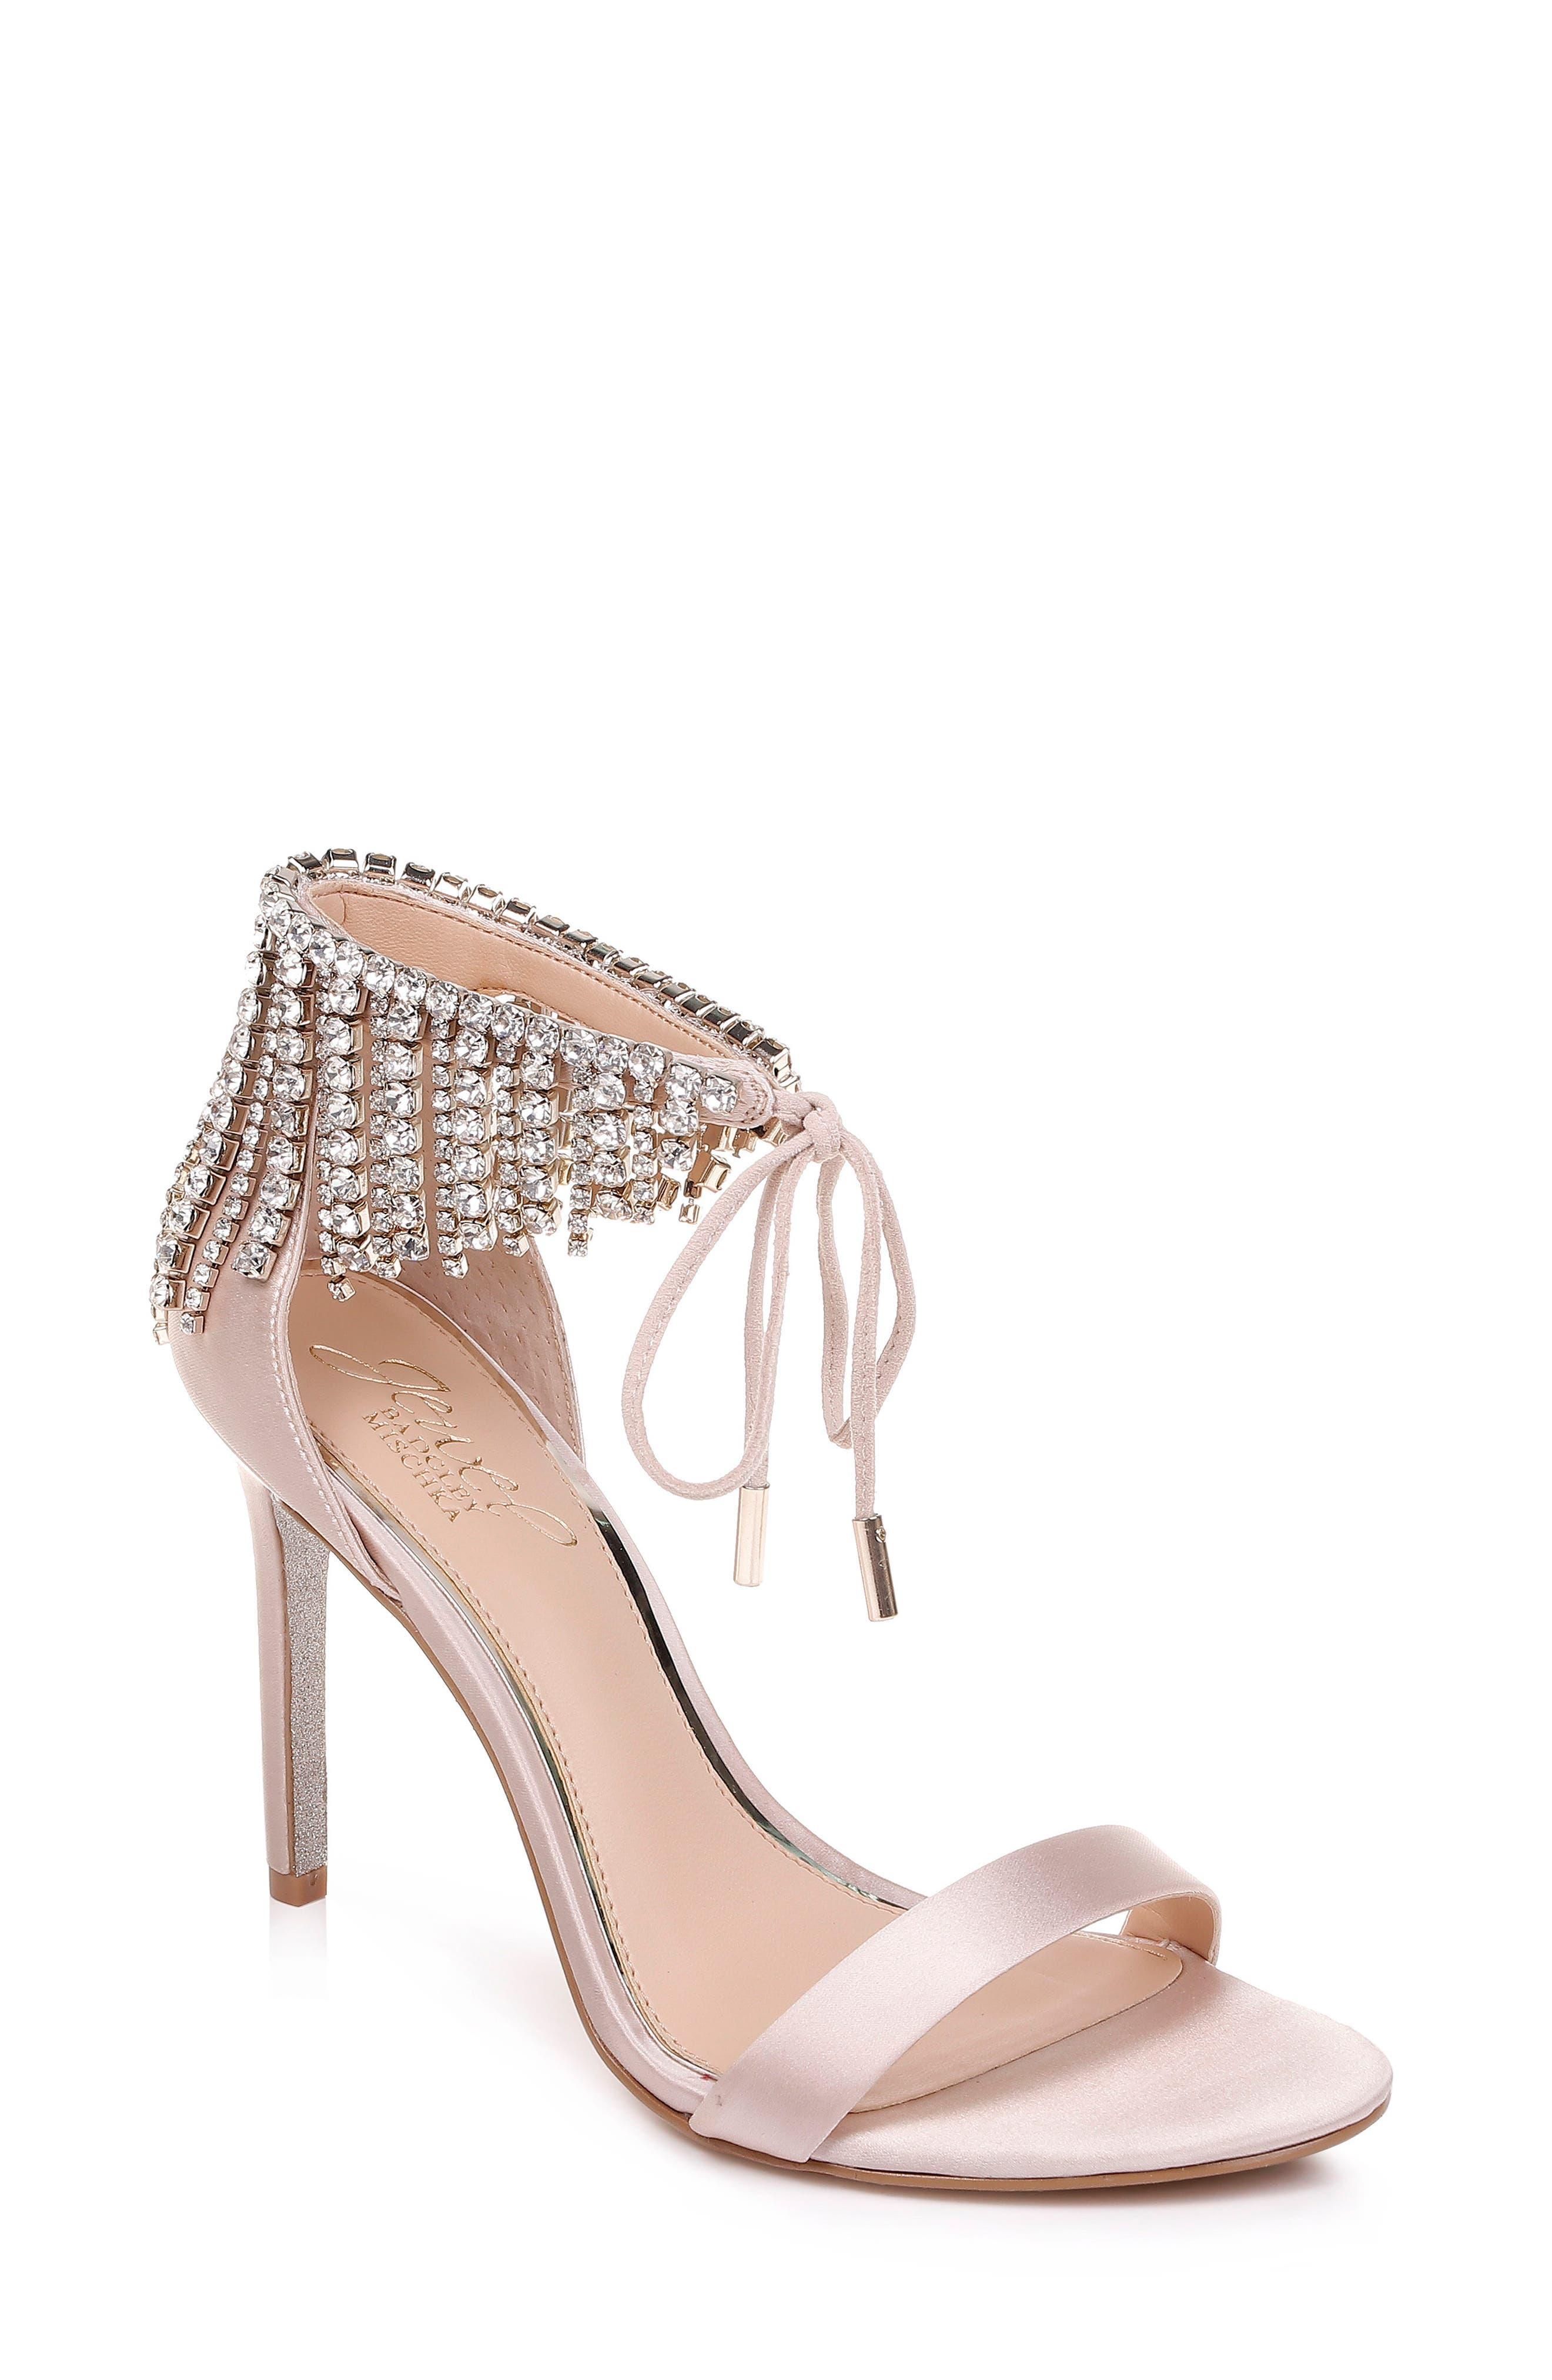 Jewel Badgley Mischka Darielle Ankle Strap Sandal- Ivory